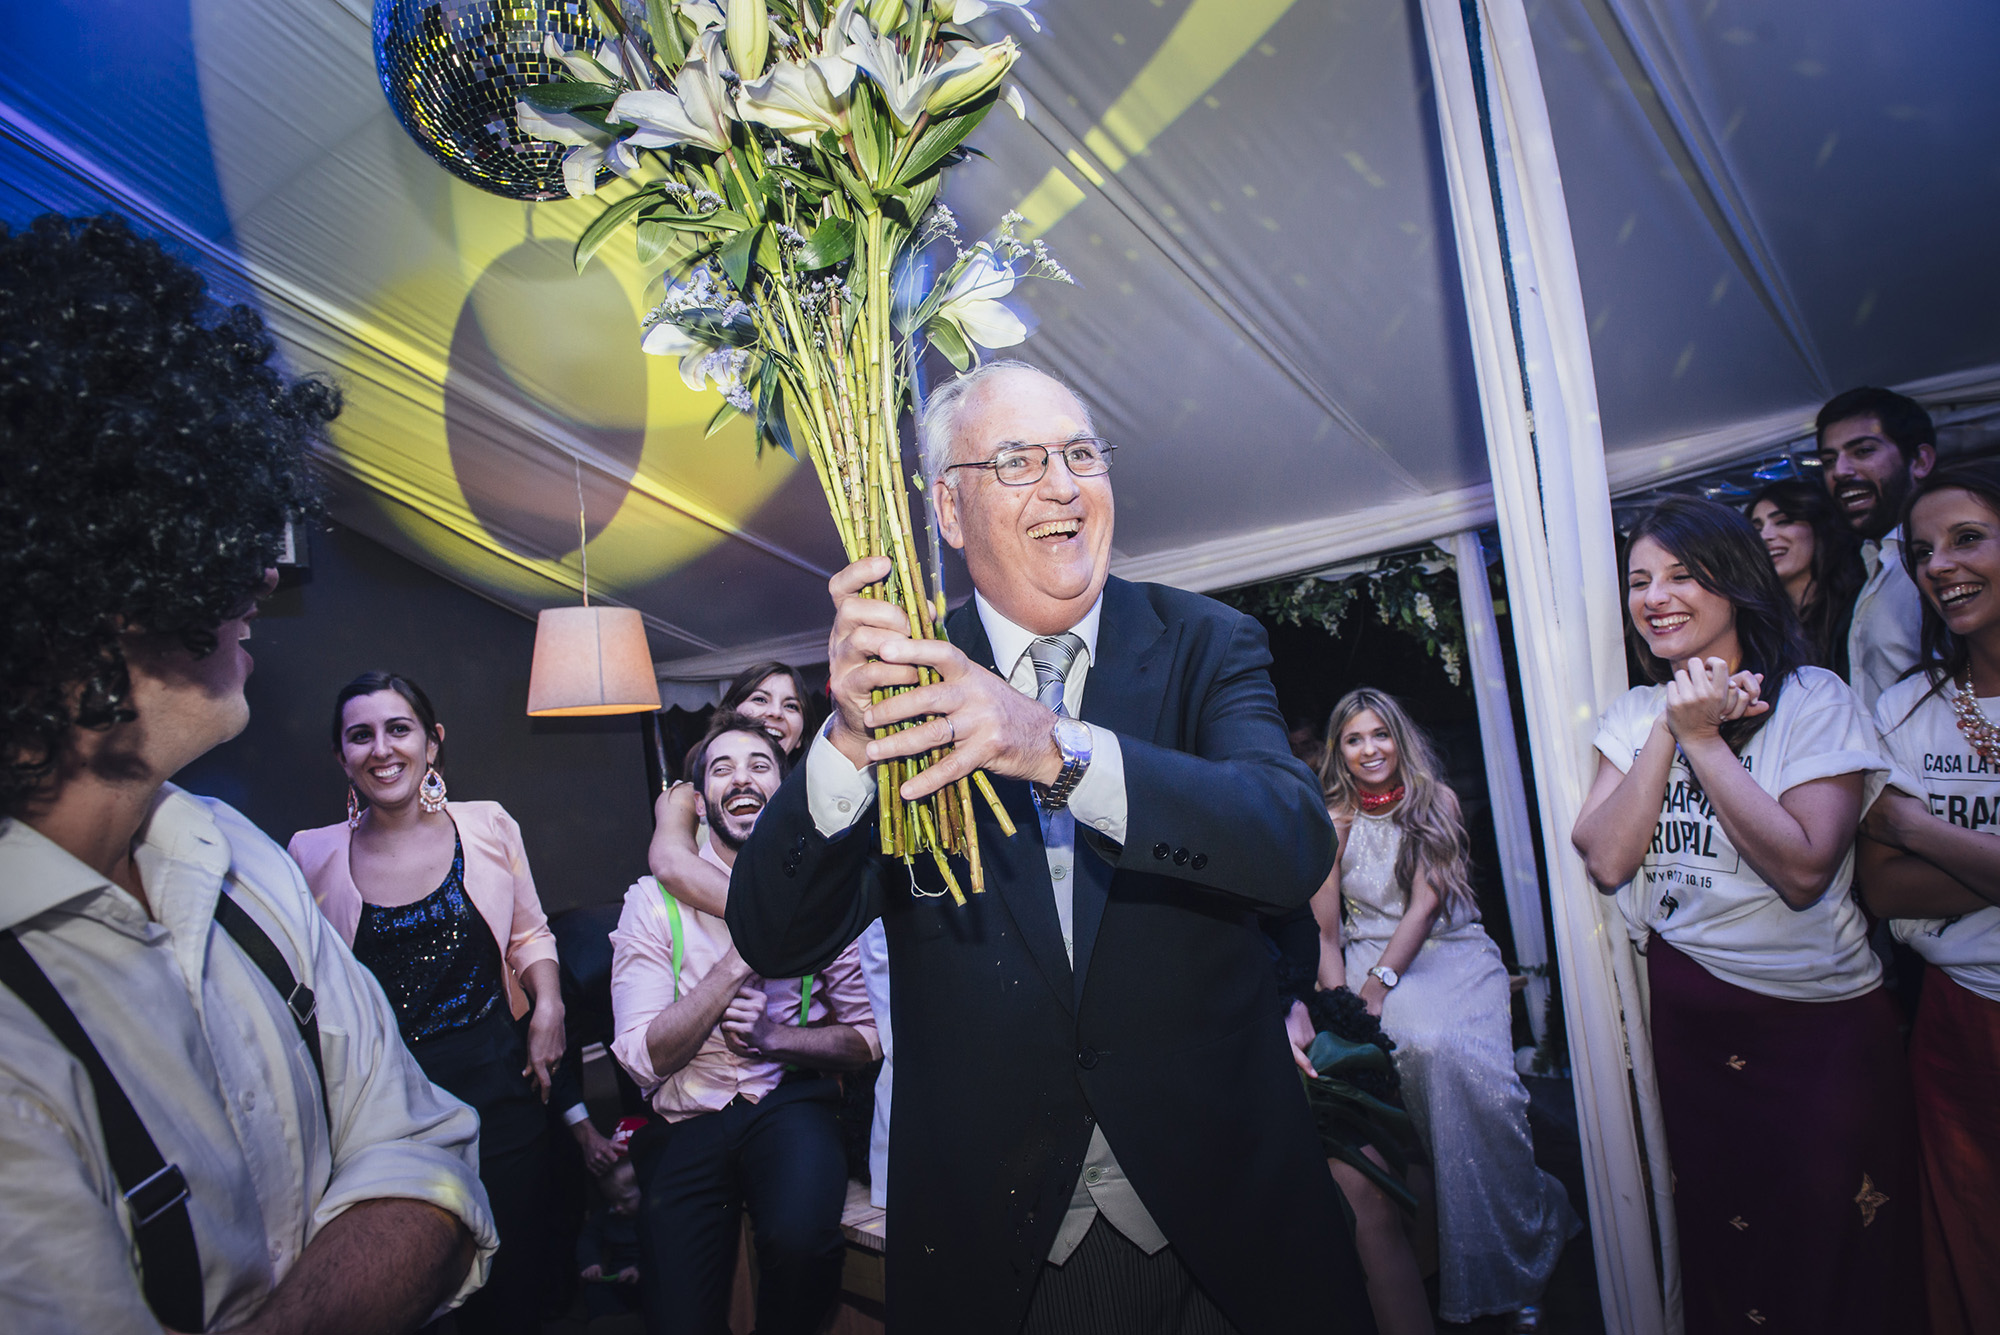 patricia-riba-casamiento-montevideo-uruguay-lindolfo-85